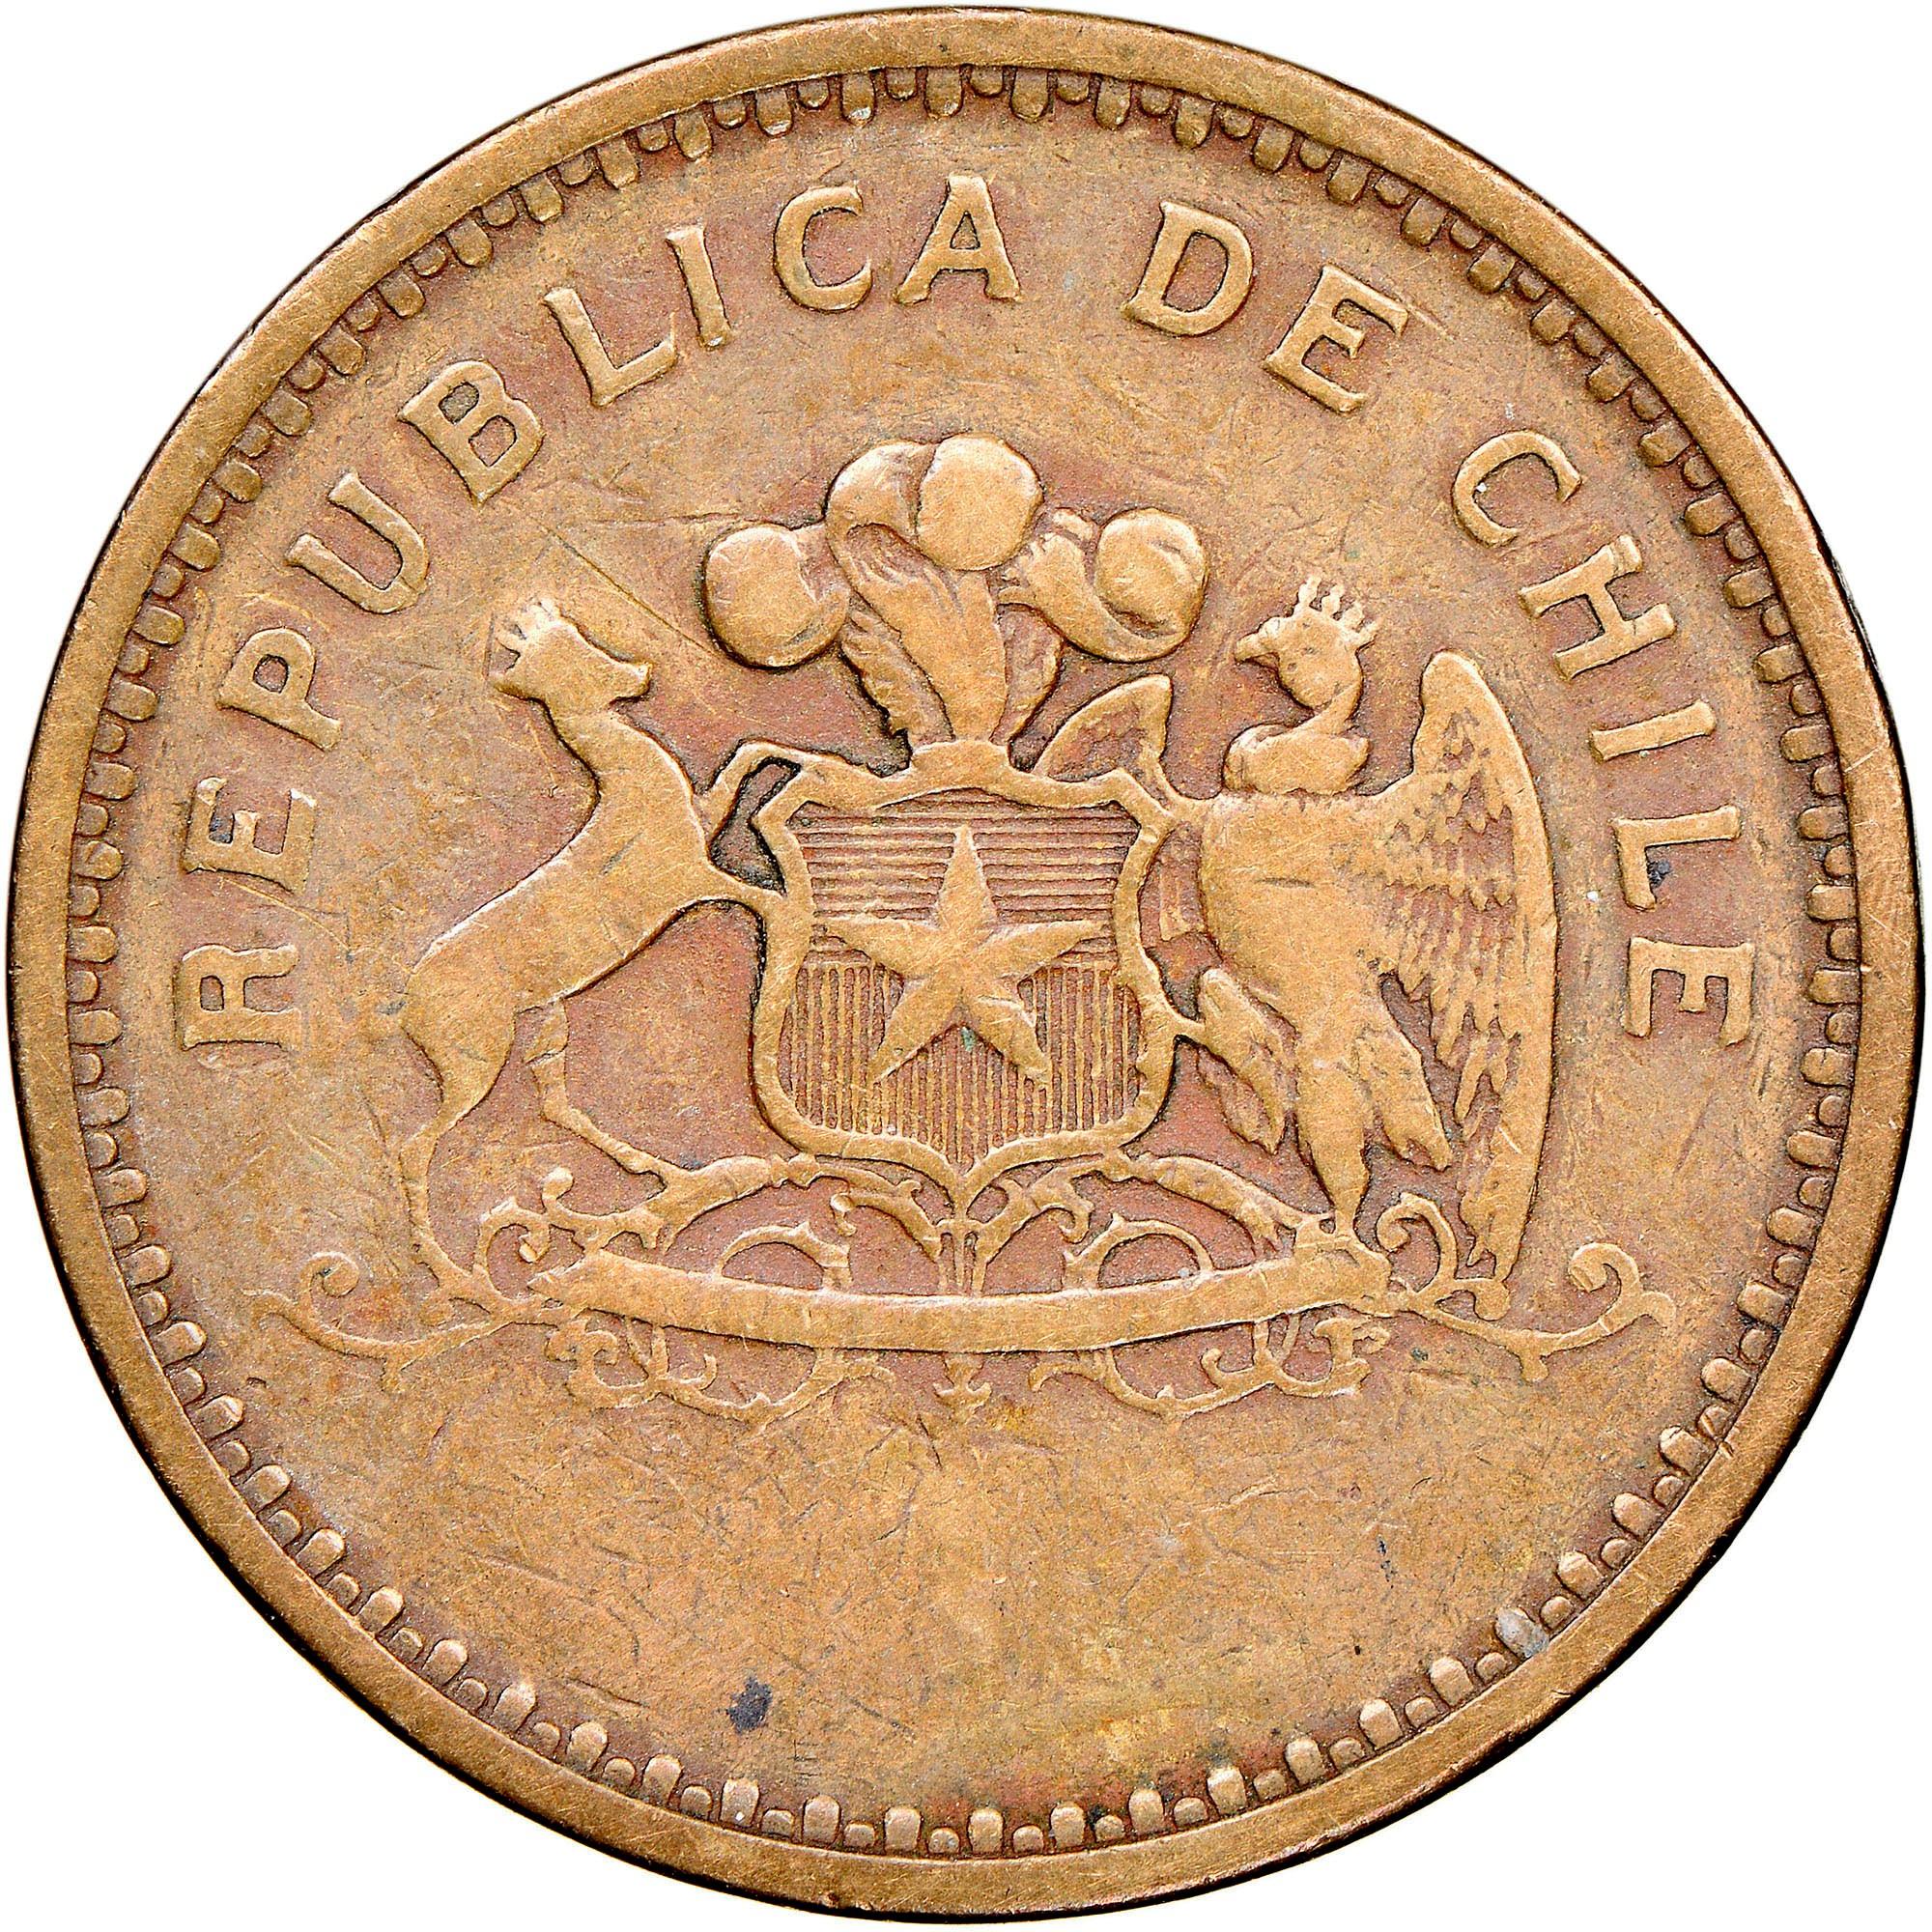 Chile 100 Pesos obverse